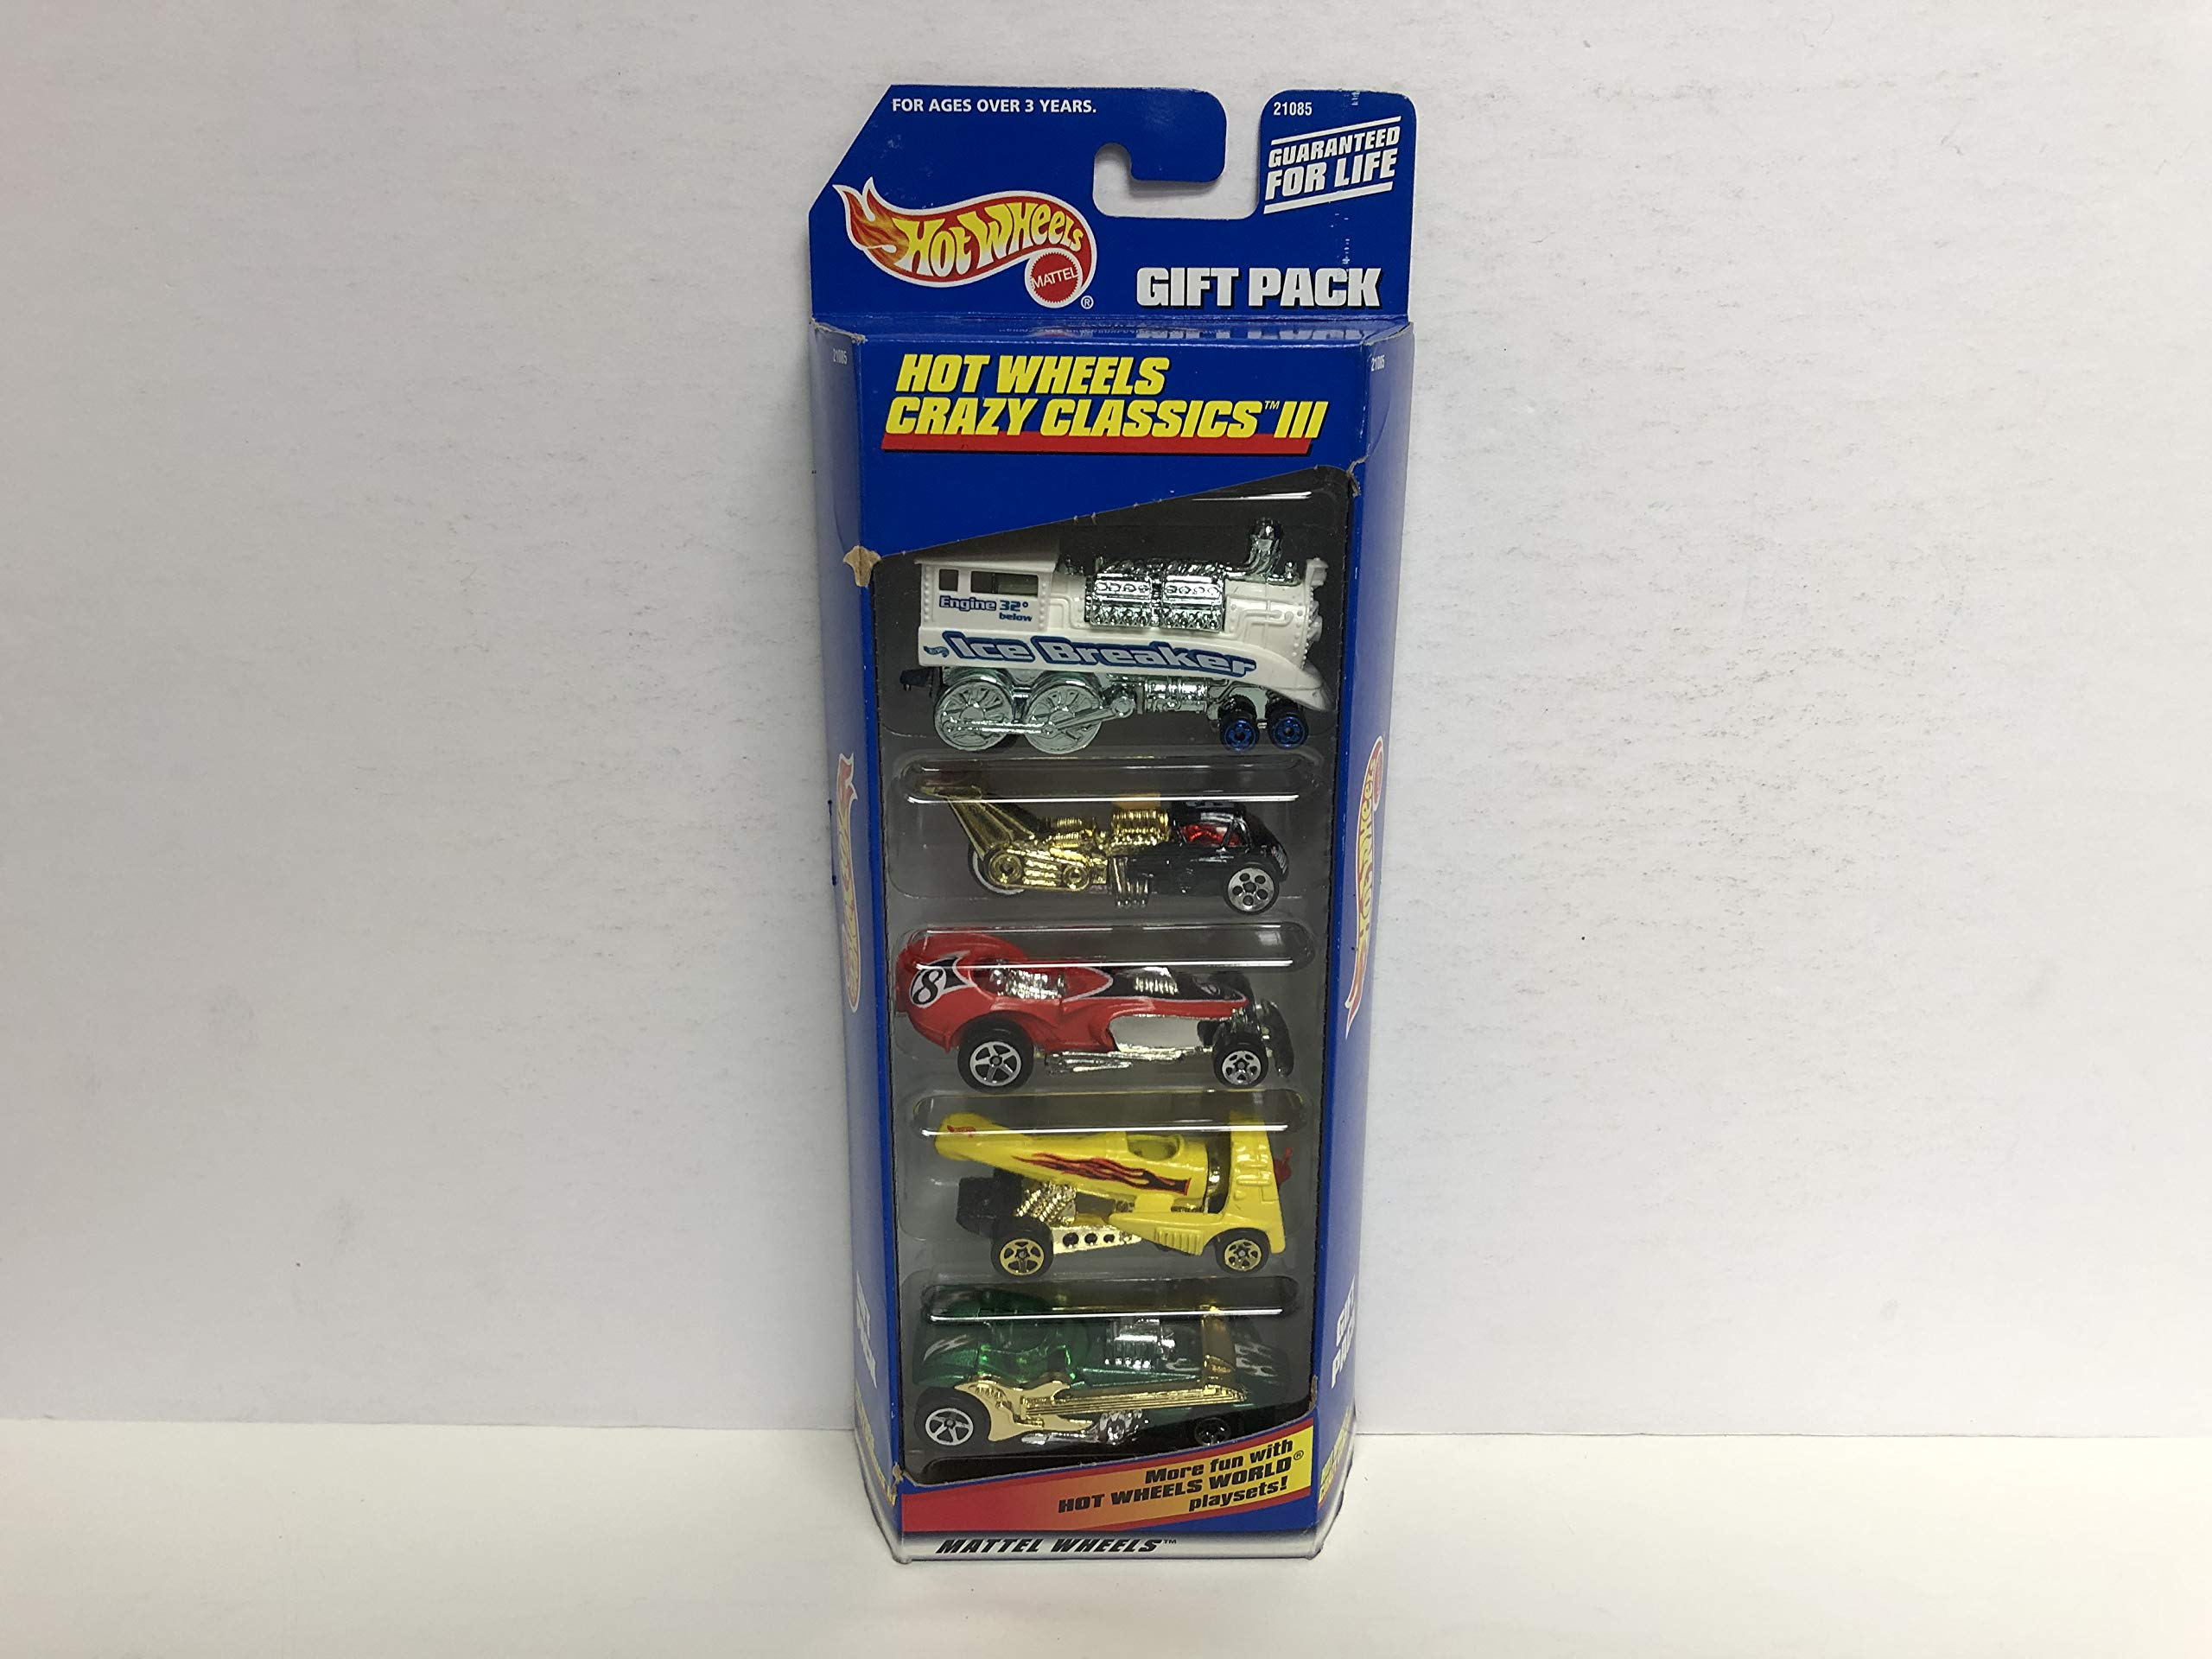 1998 Hot Wheels diecast car HOT WHEELS CRAZY CLASSICS III 5 CAR Gift Pack #21085